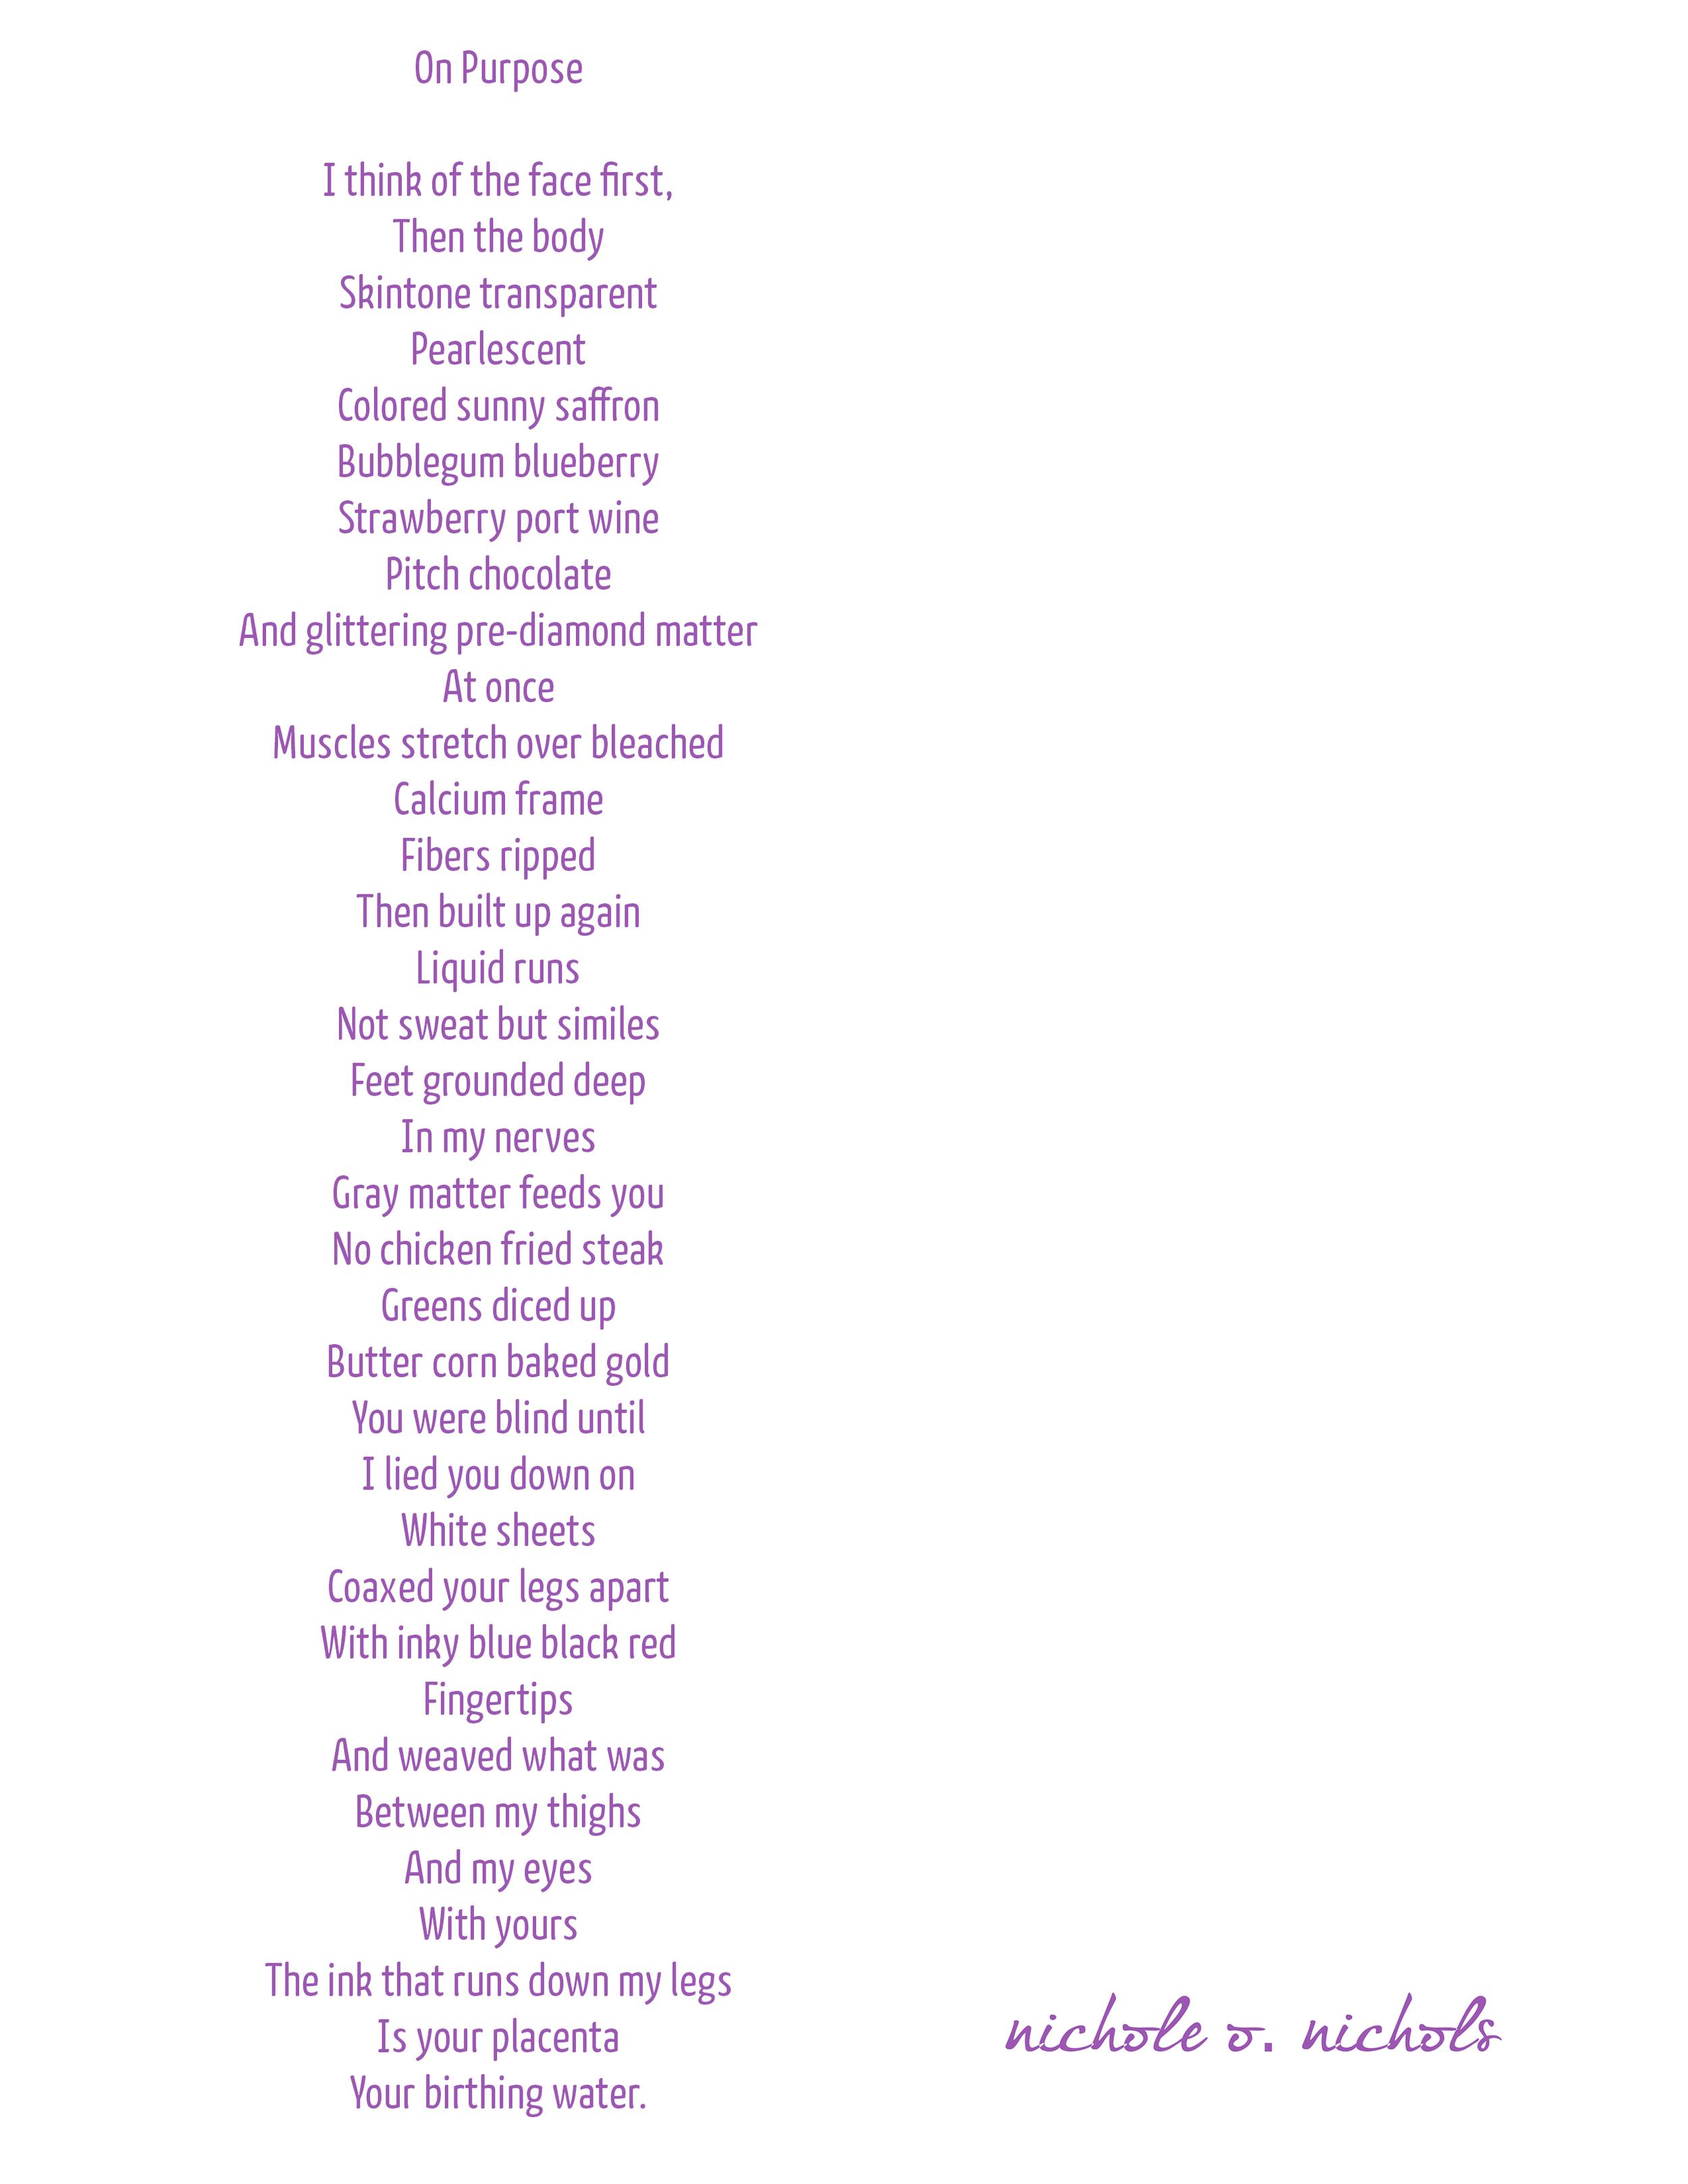 Poem_OnPurpose